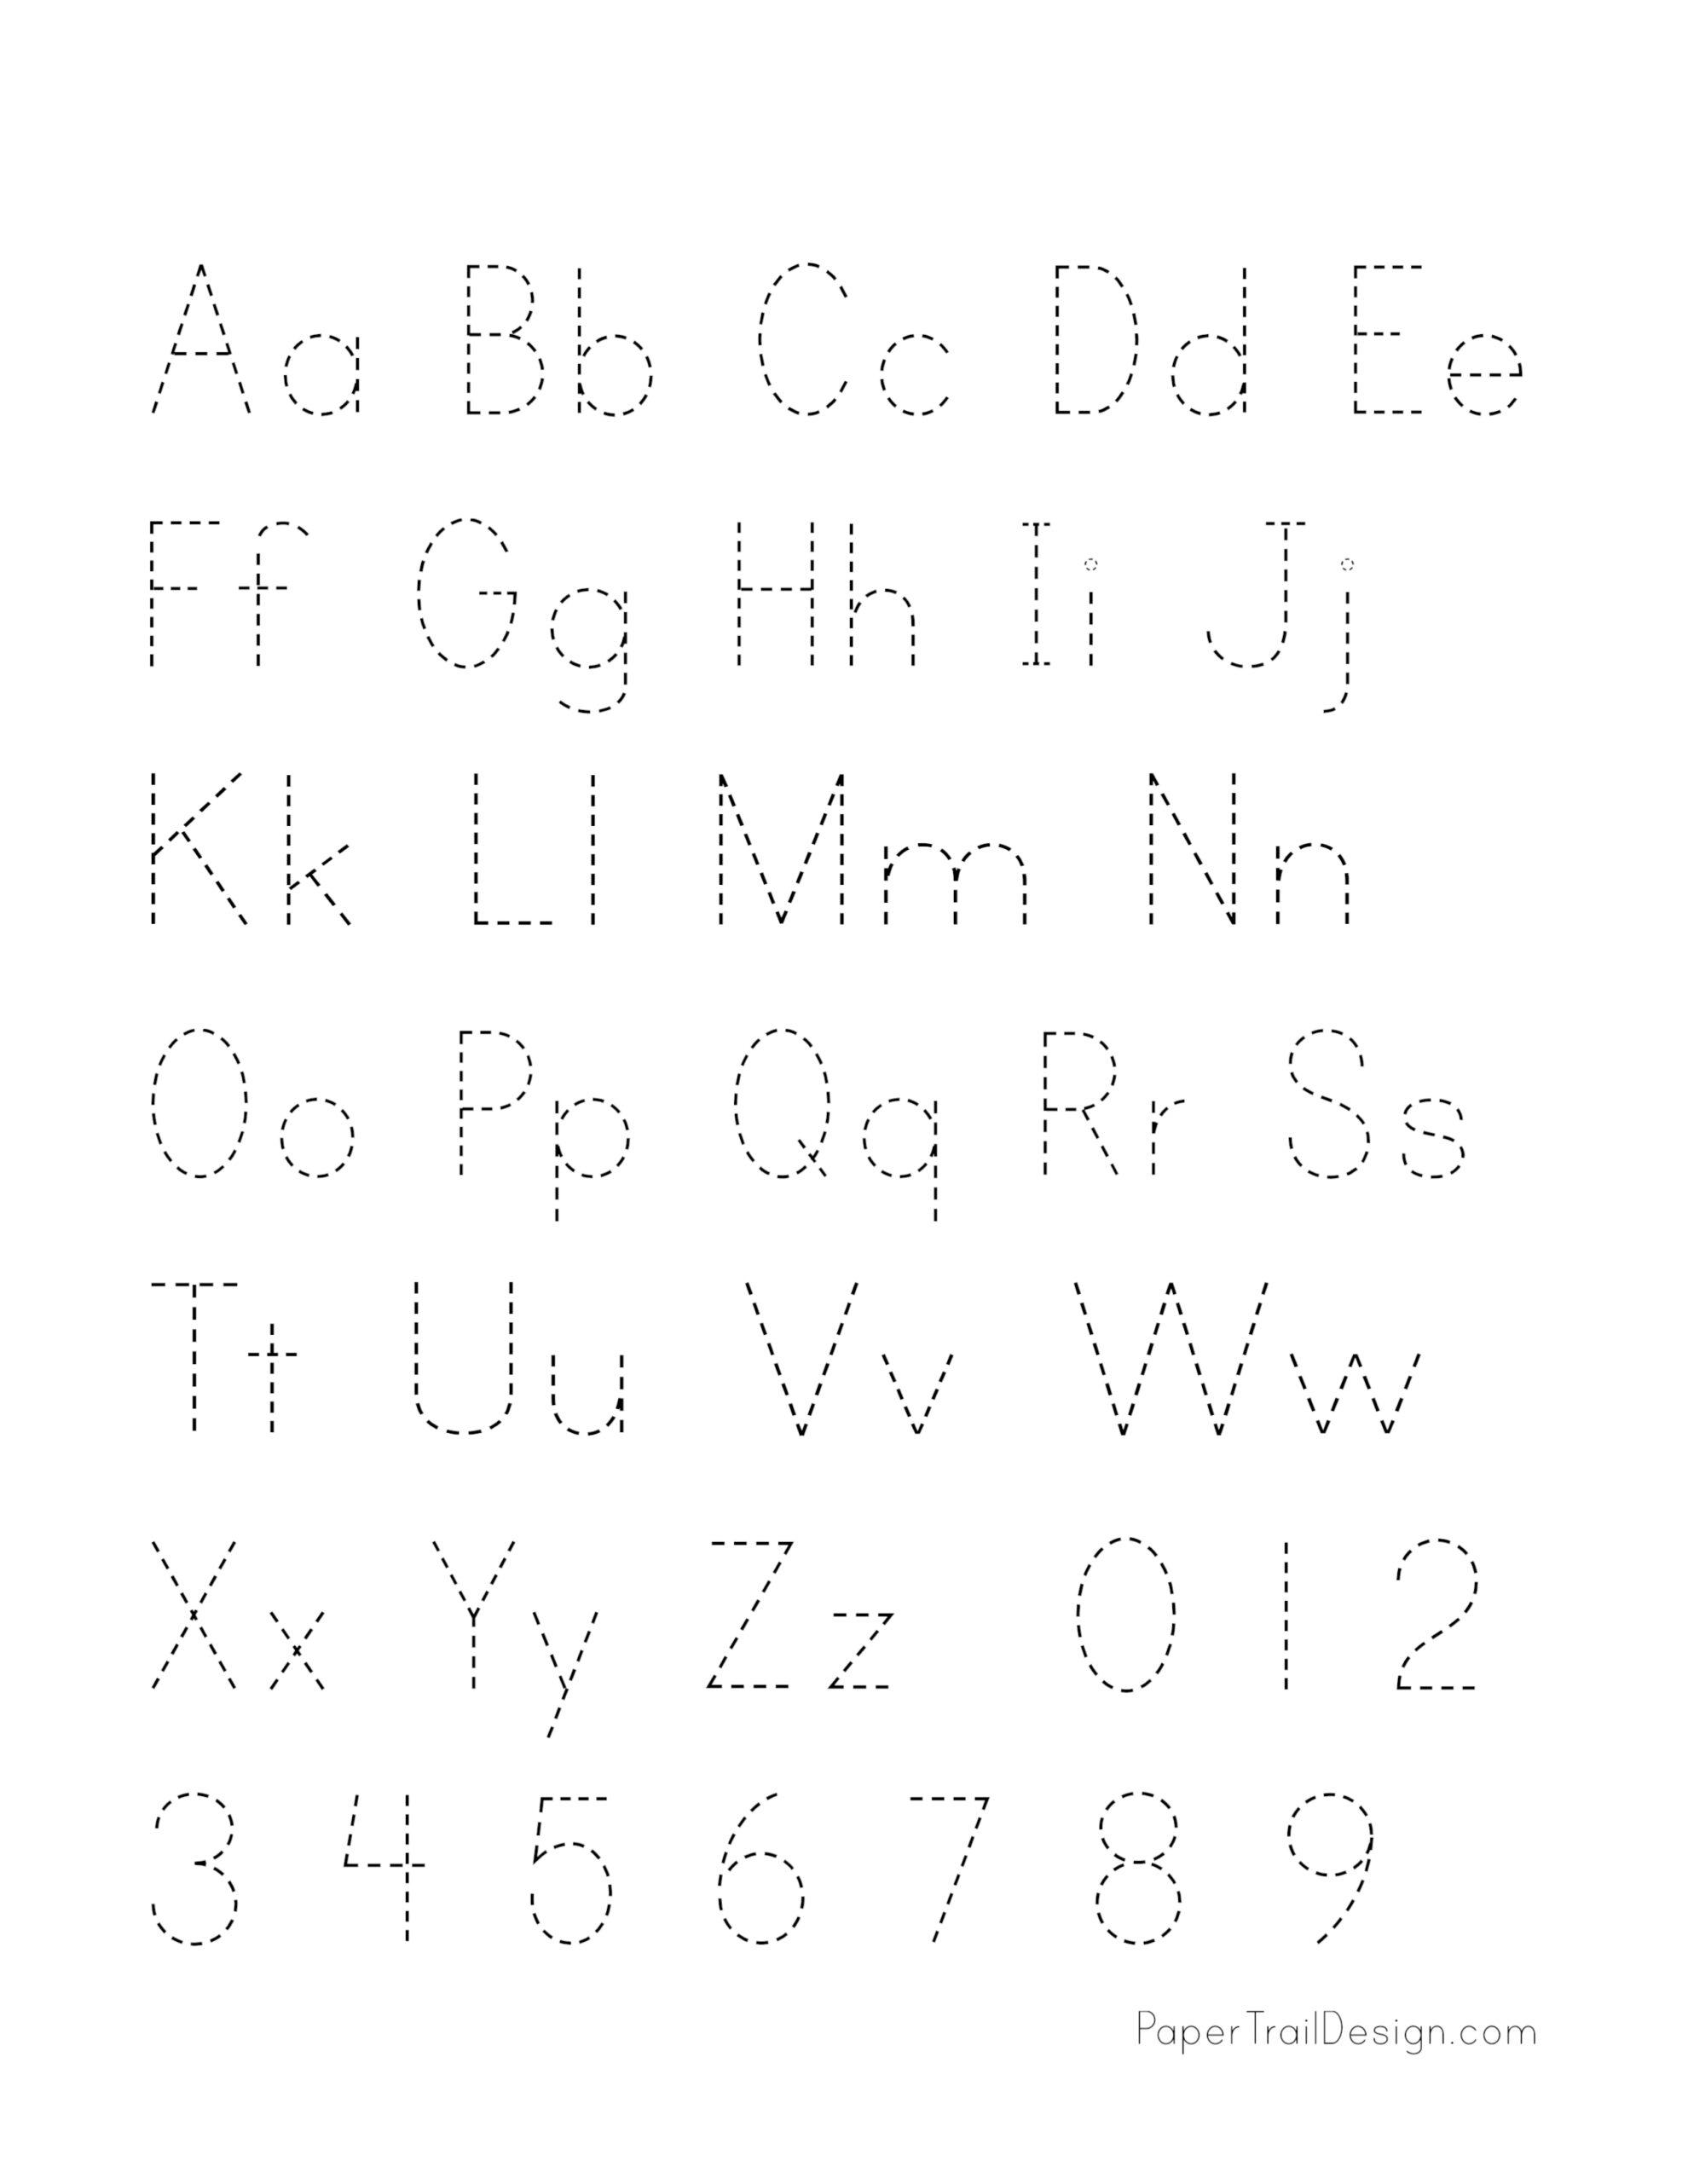 Free Printable Alphabet Handwriting Practice Sheets ...